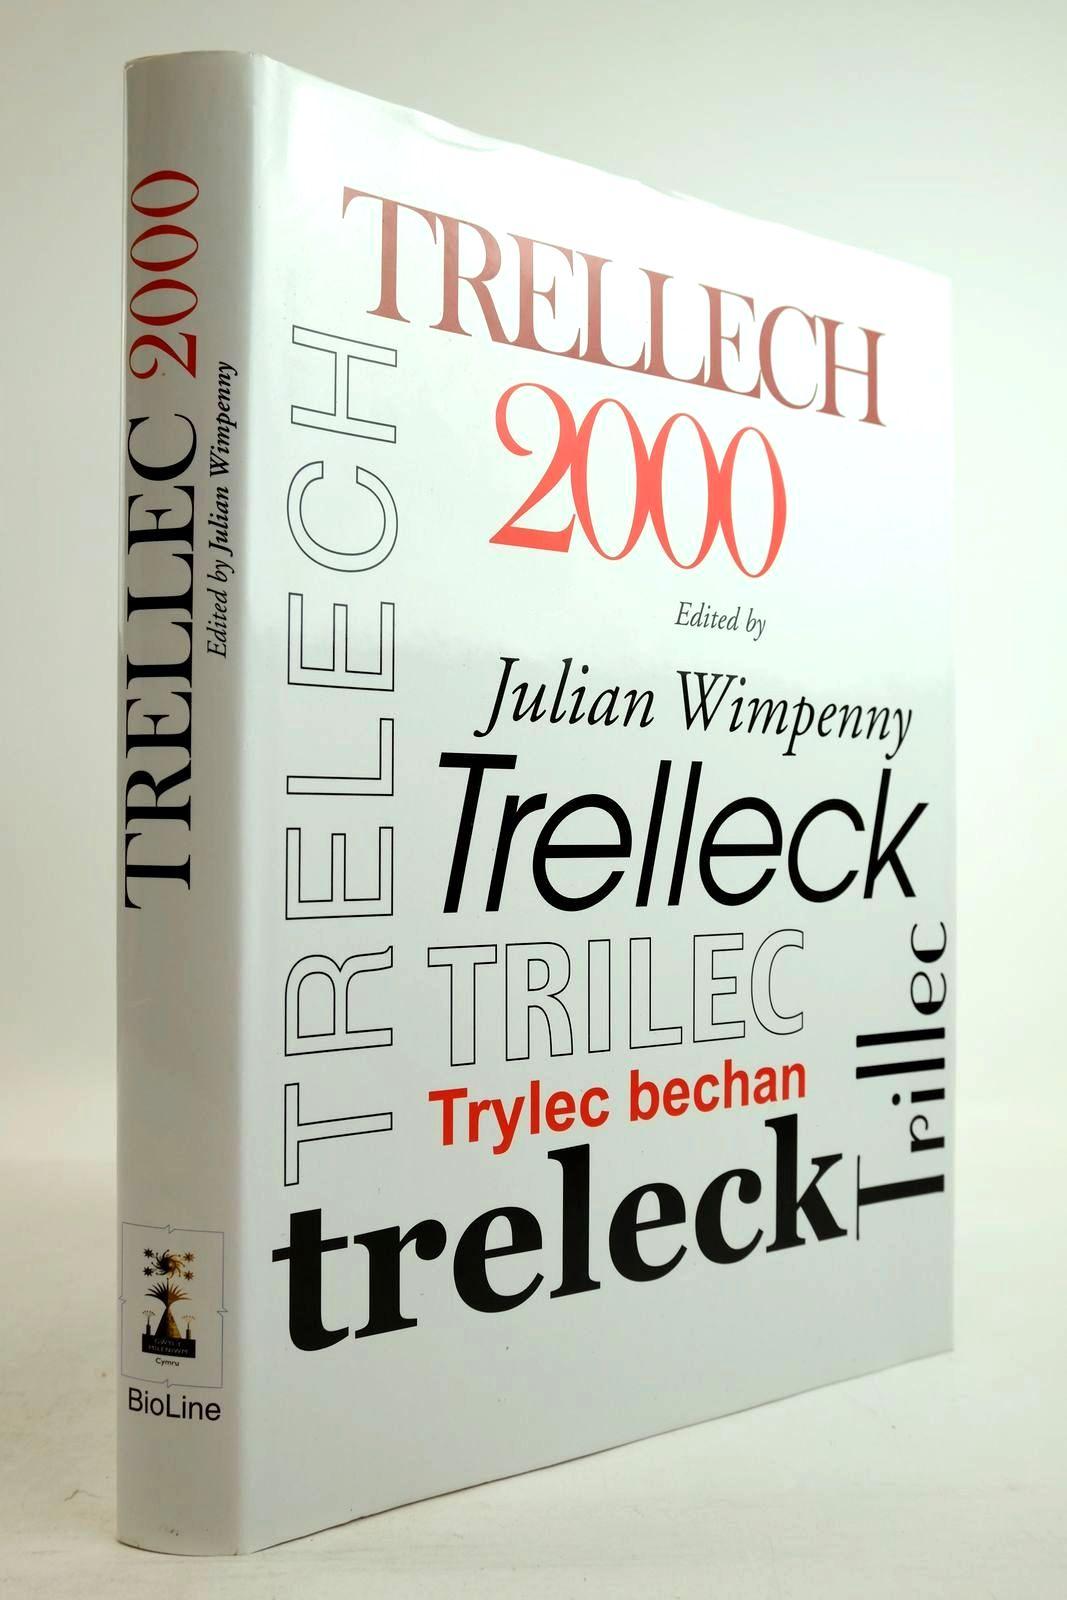 Photo of TRELLECH 2000- Stock Number: 2134367